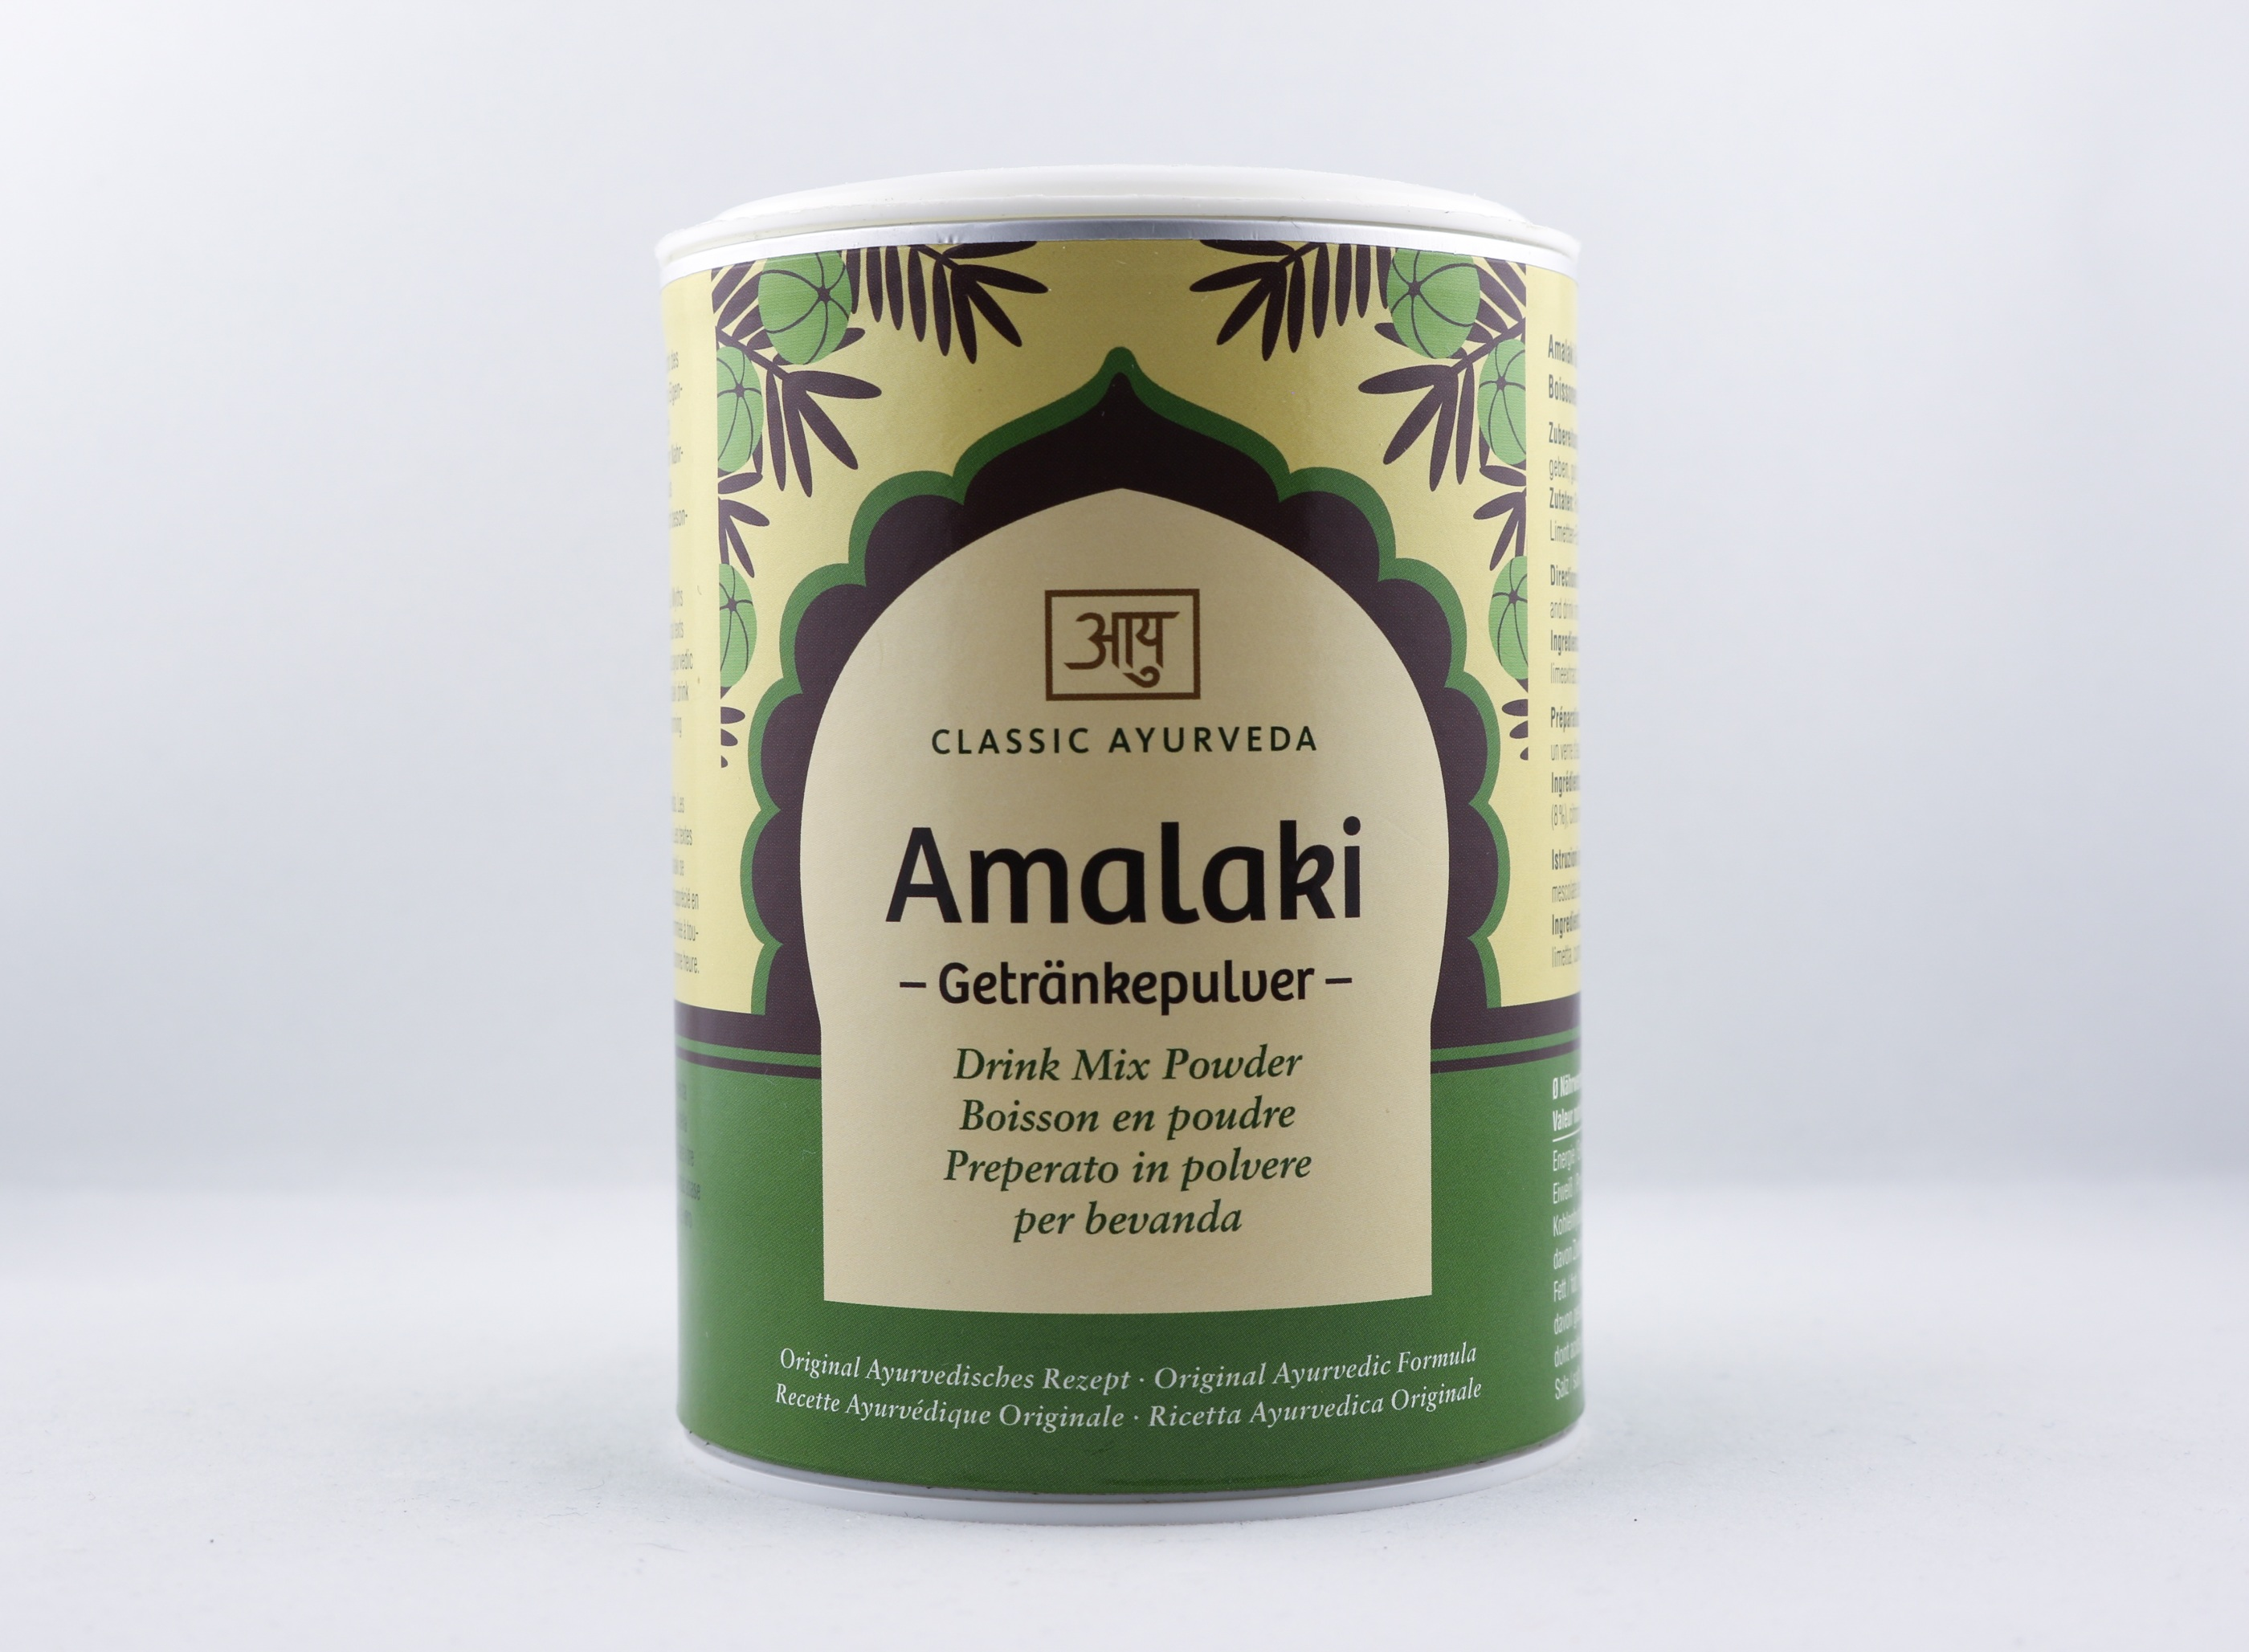 Amalaki Wellness Ayurveda Halmstadmassören Halmstad Sverige Sweden svensk pulver eko ekologiskt